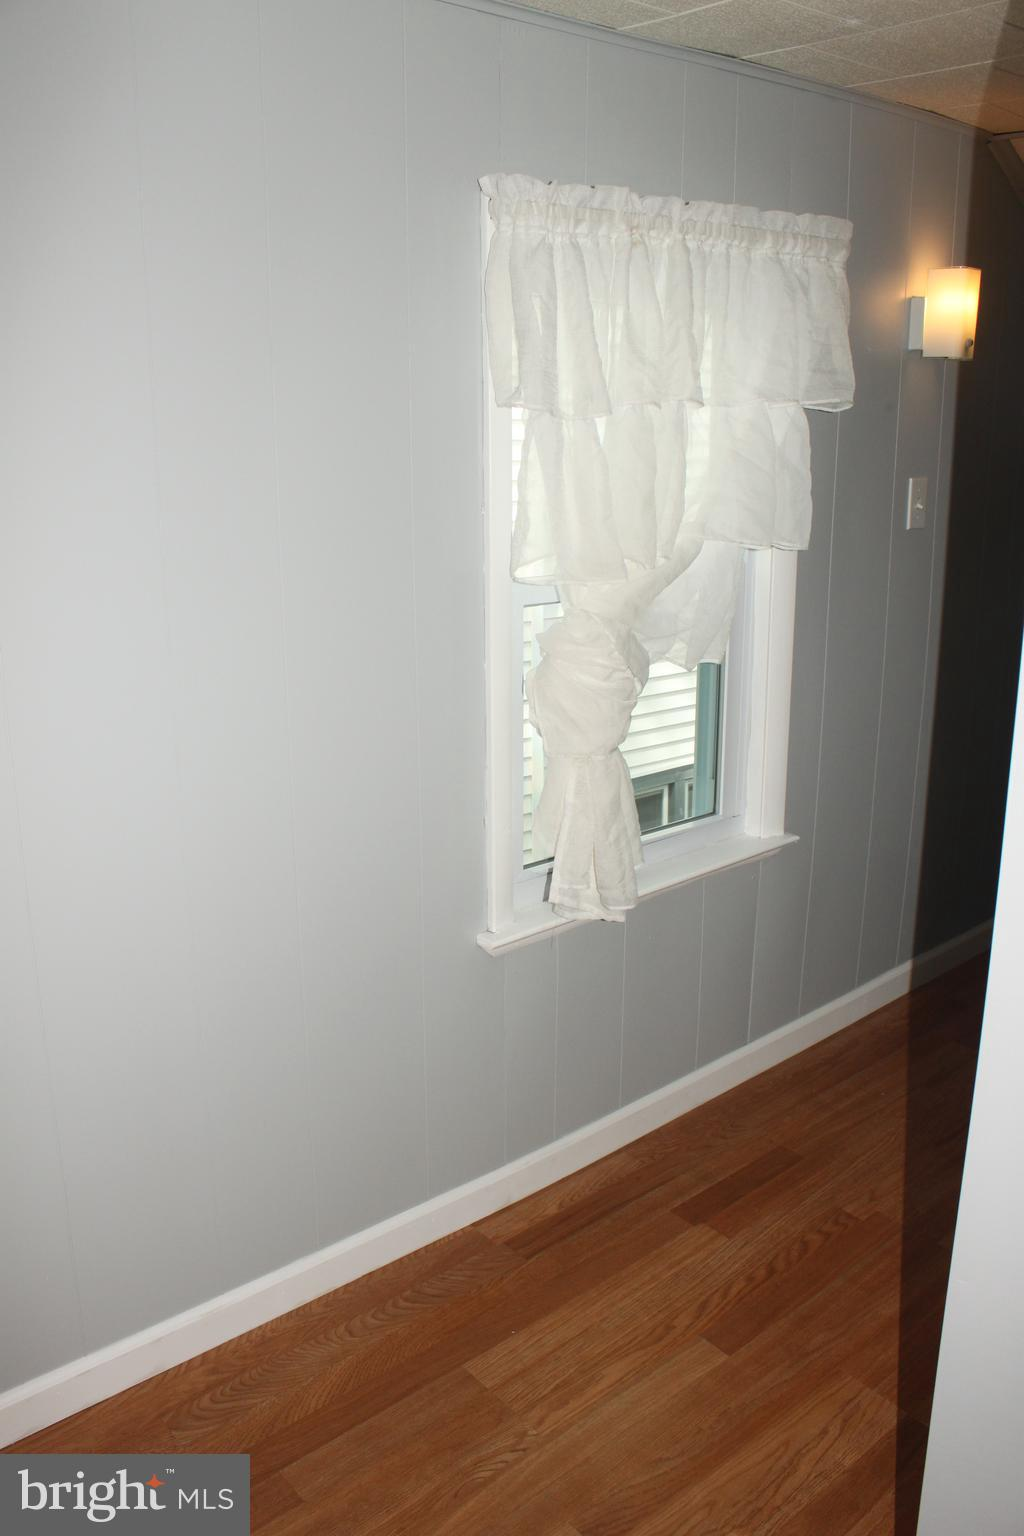 Upstairs hallway view